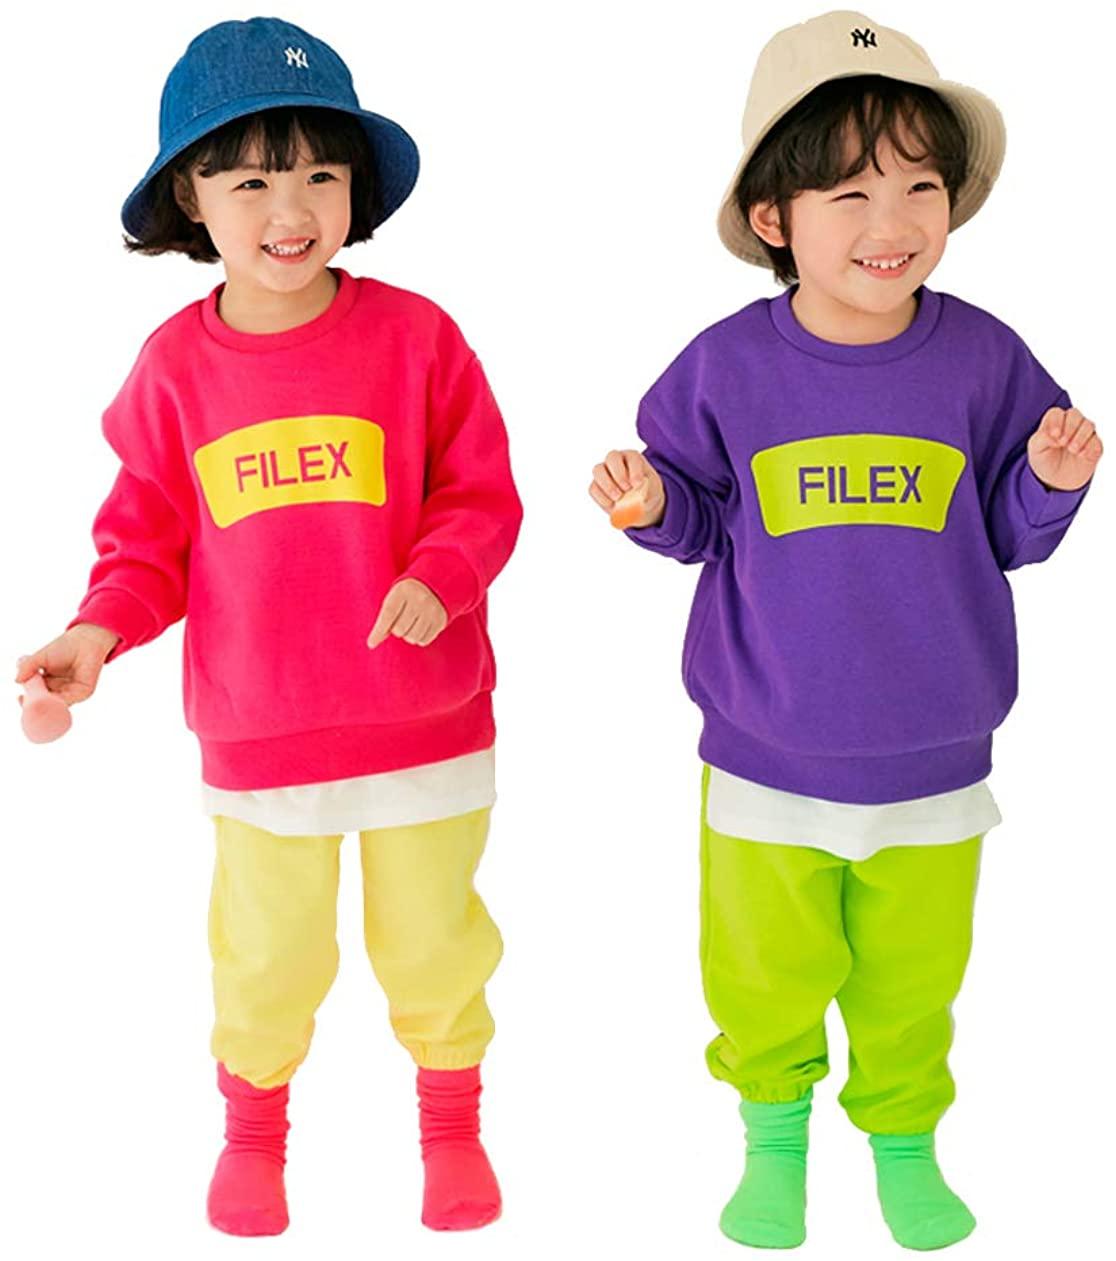 EUCACA 2Pcs Kids Boys Girls Clothing Sets Long-Sleeved + Pants 2-7Years Old Filex Set 2Color